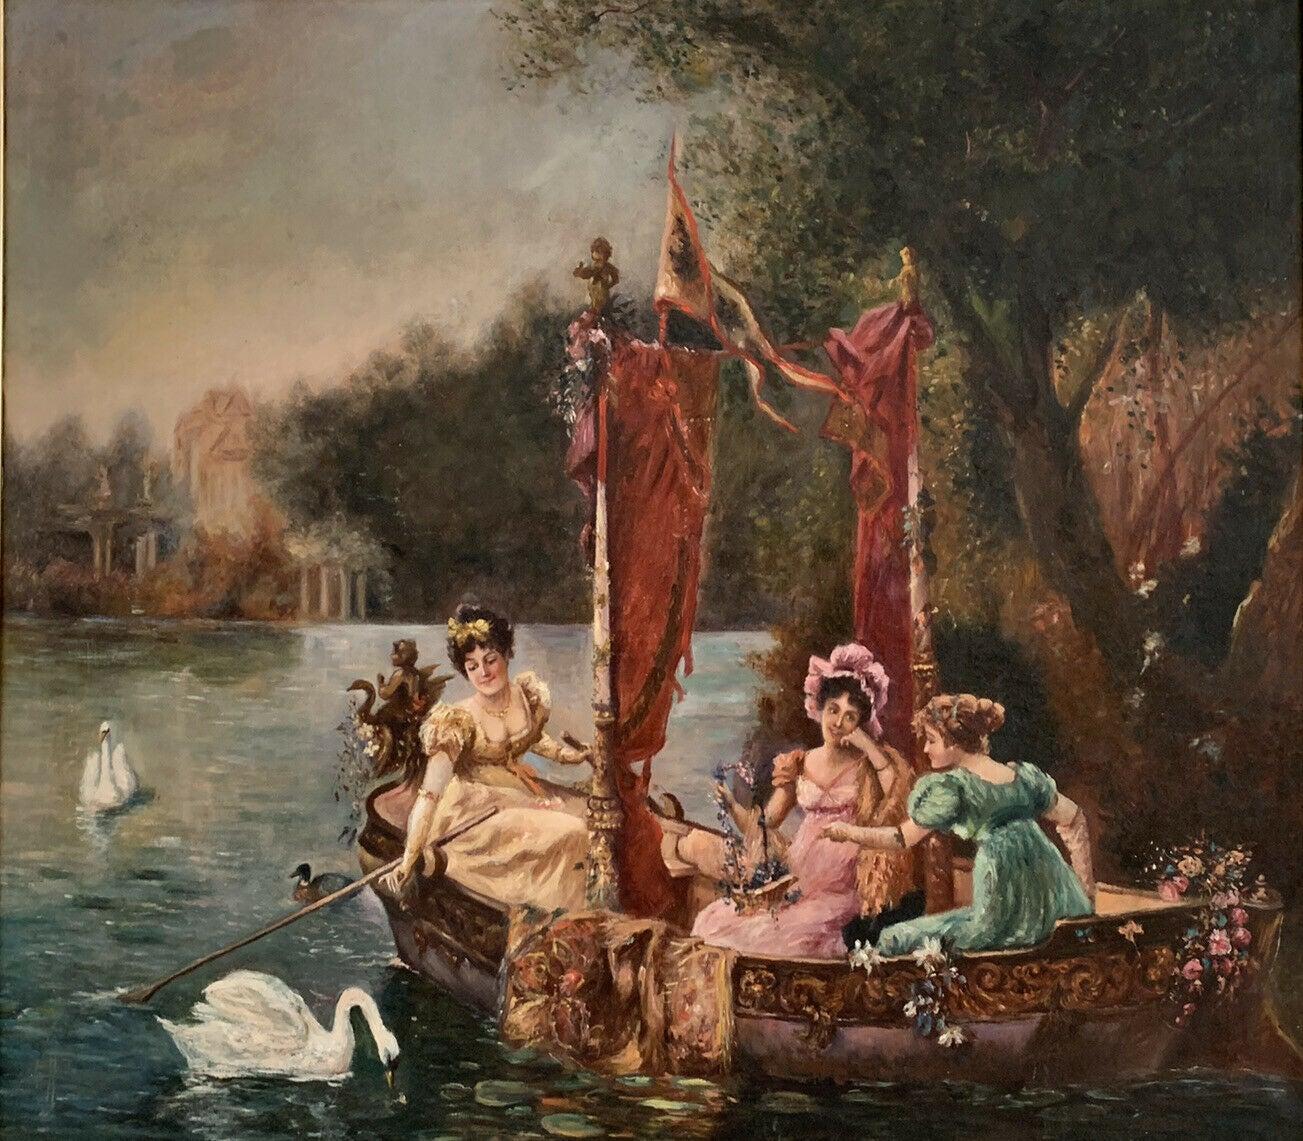 C. 1900 FRENCH BELLE EPOQUE HUGE OIL PAINTING - ELEGANT LADIES BOATING ON LAKE